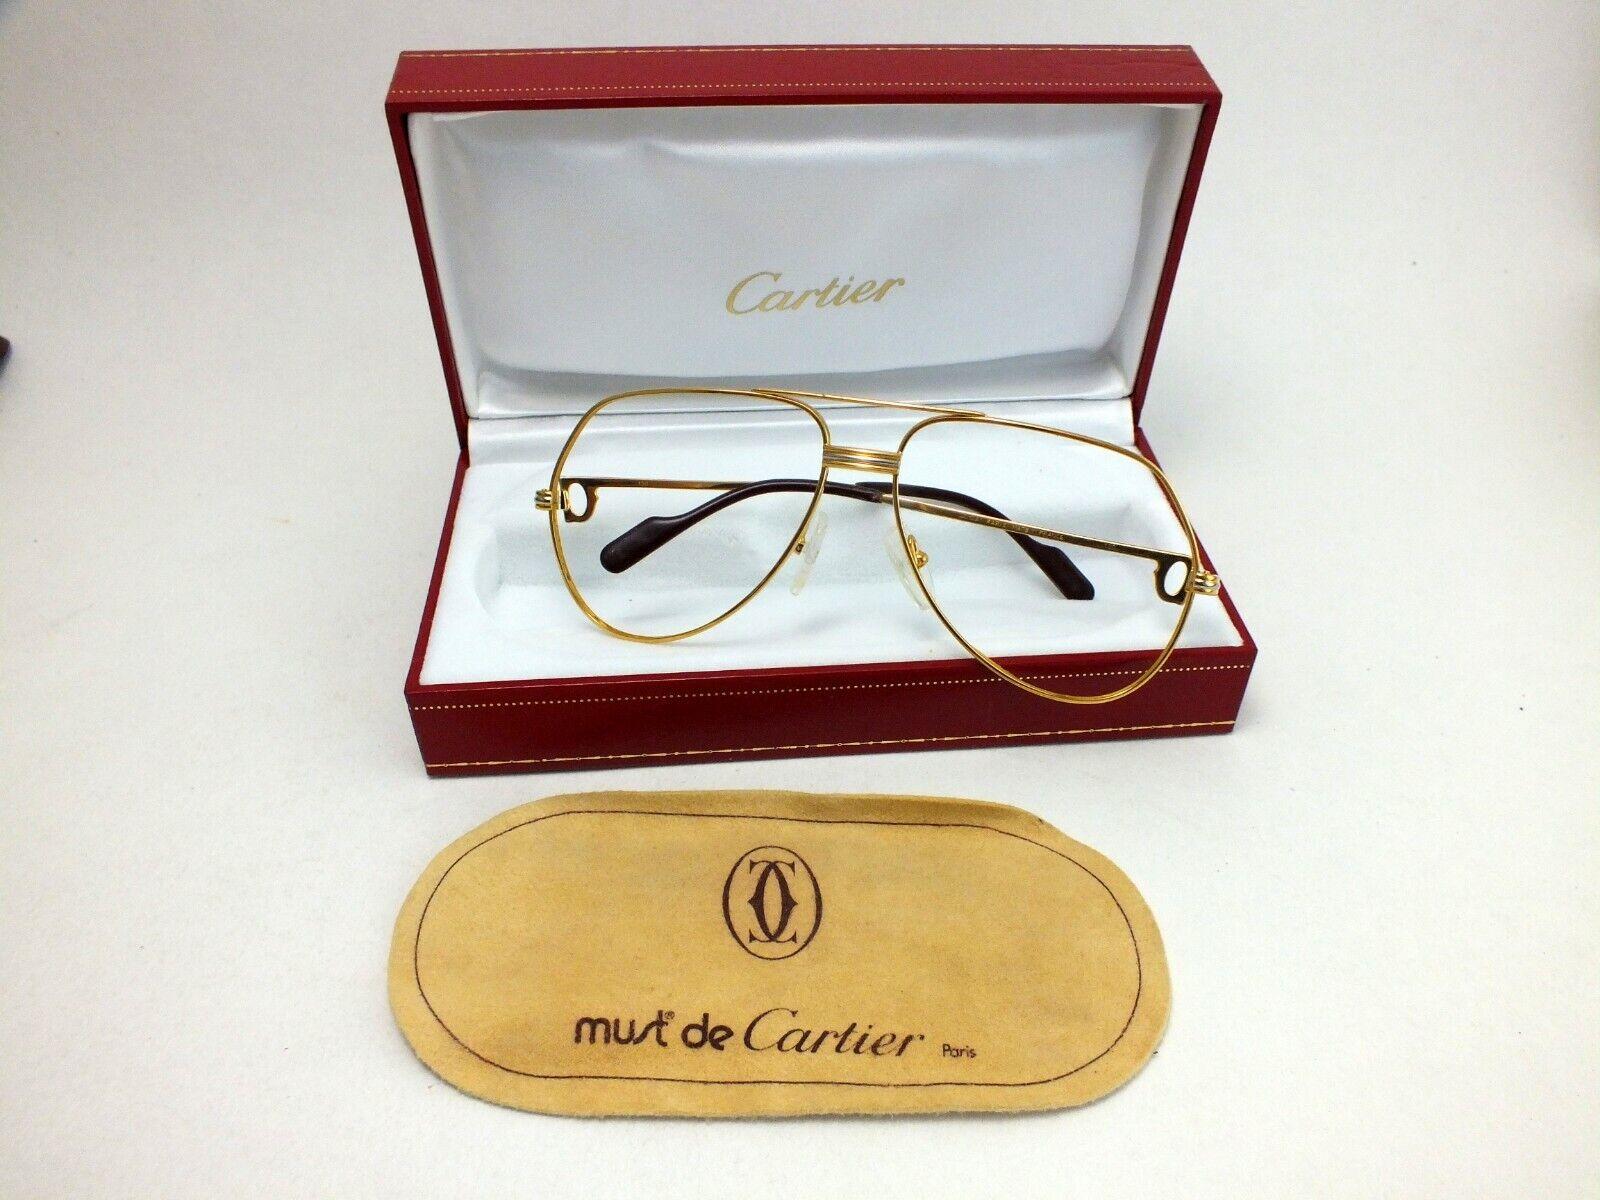 original Cartier Brille, Brillenfassung vintage glasses occhiali Must de Cartier